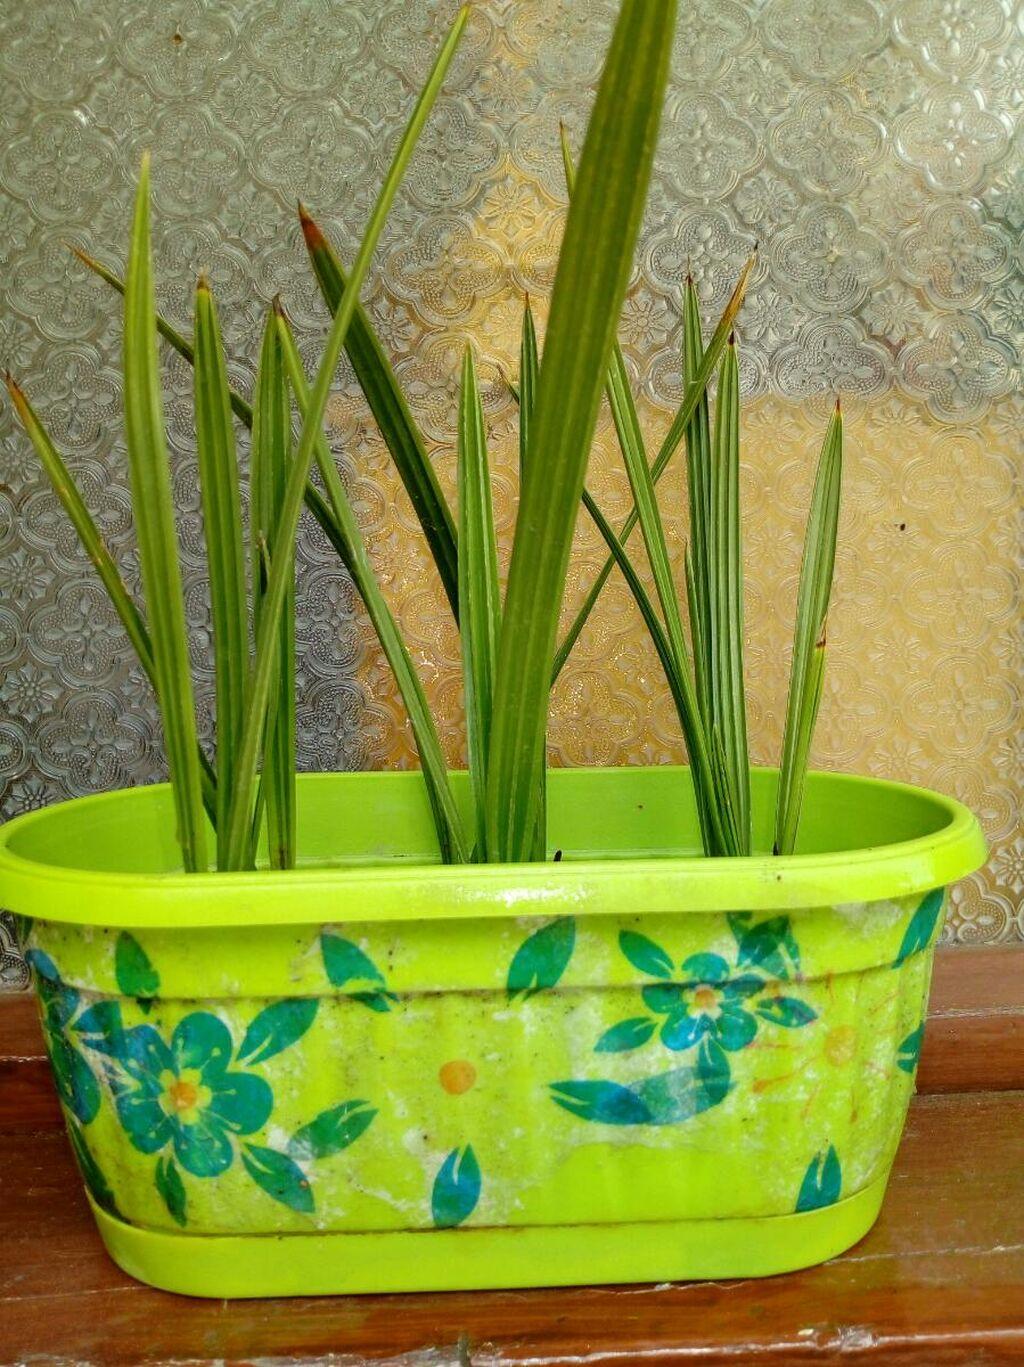 Palmice (10 kom.) visima 20-ak cm